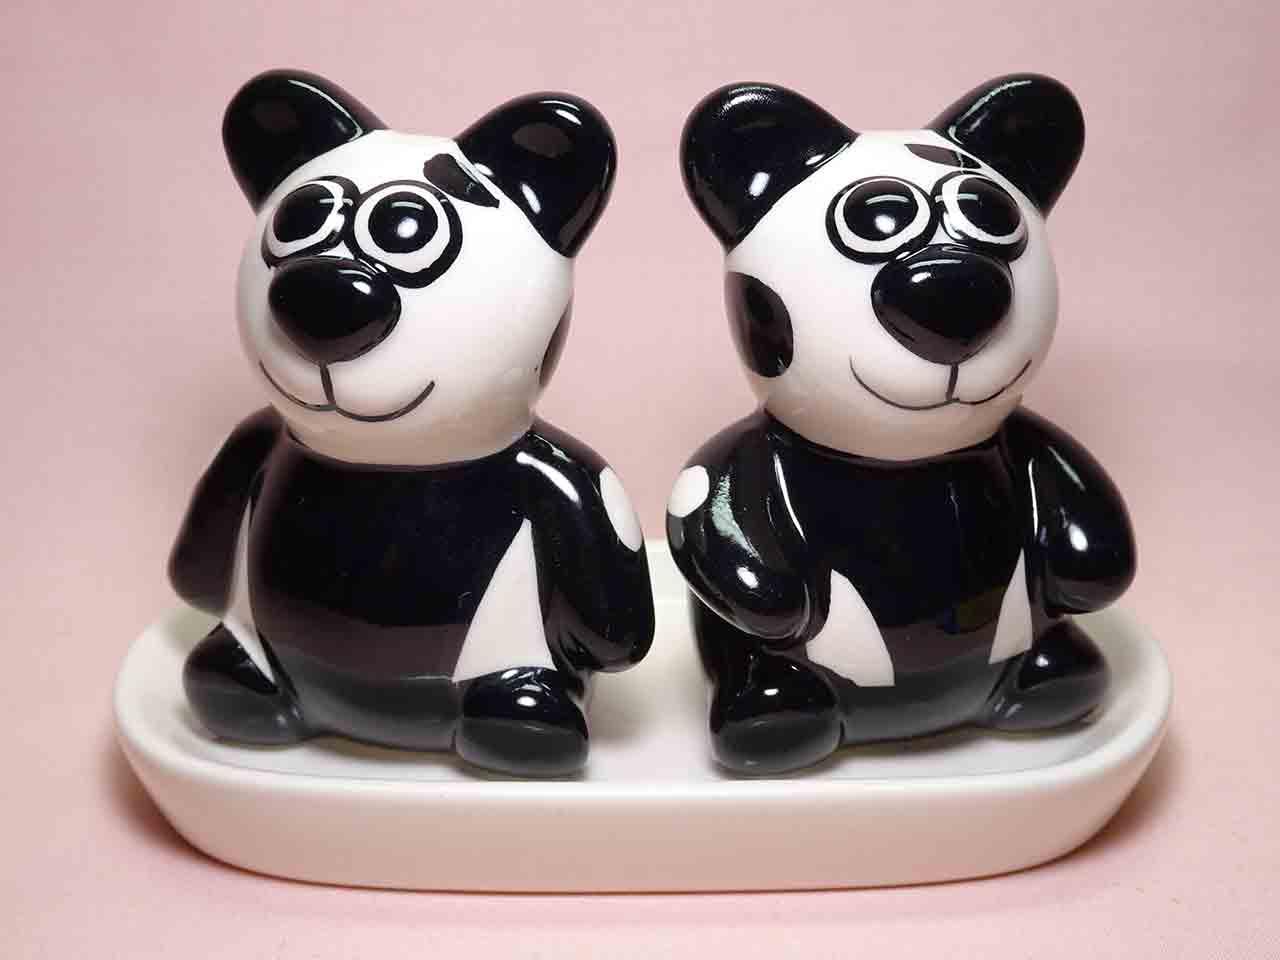 Panda bear salt and pepper shakers